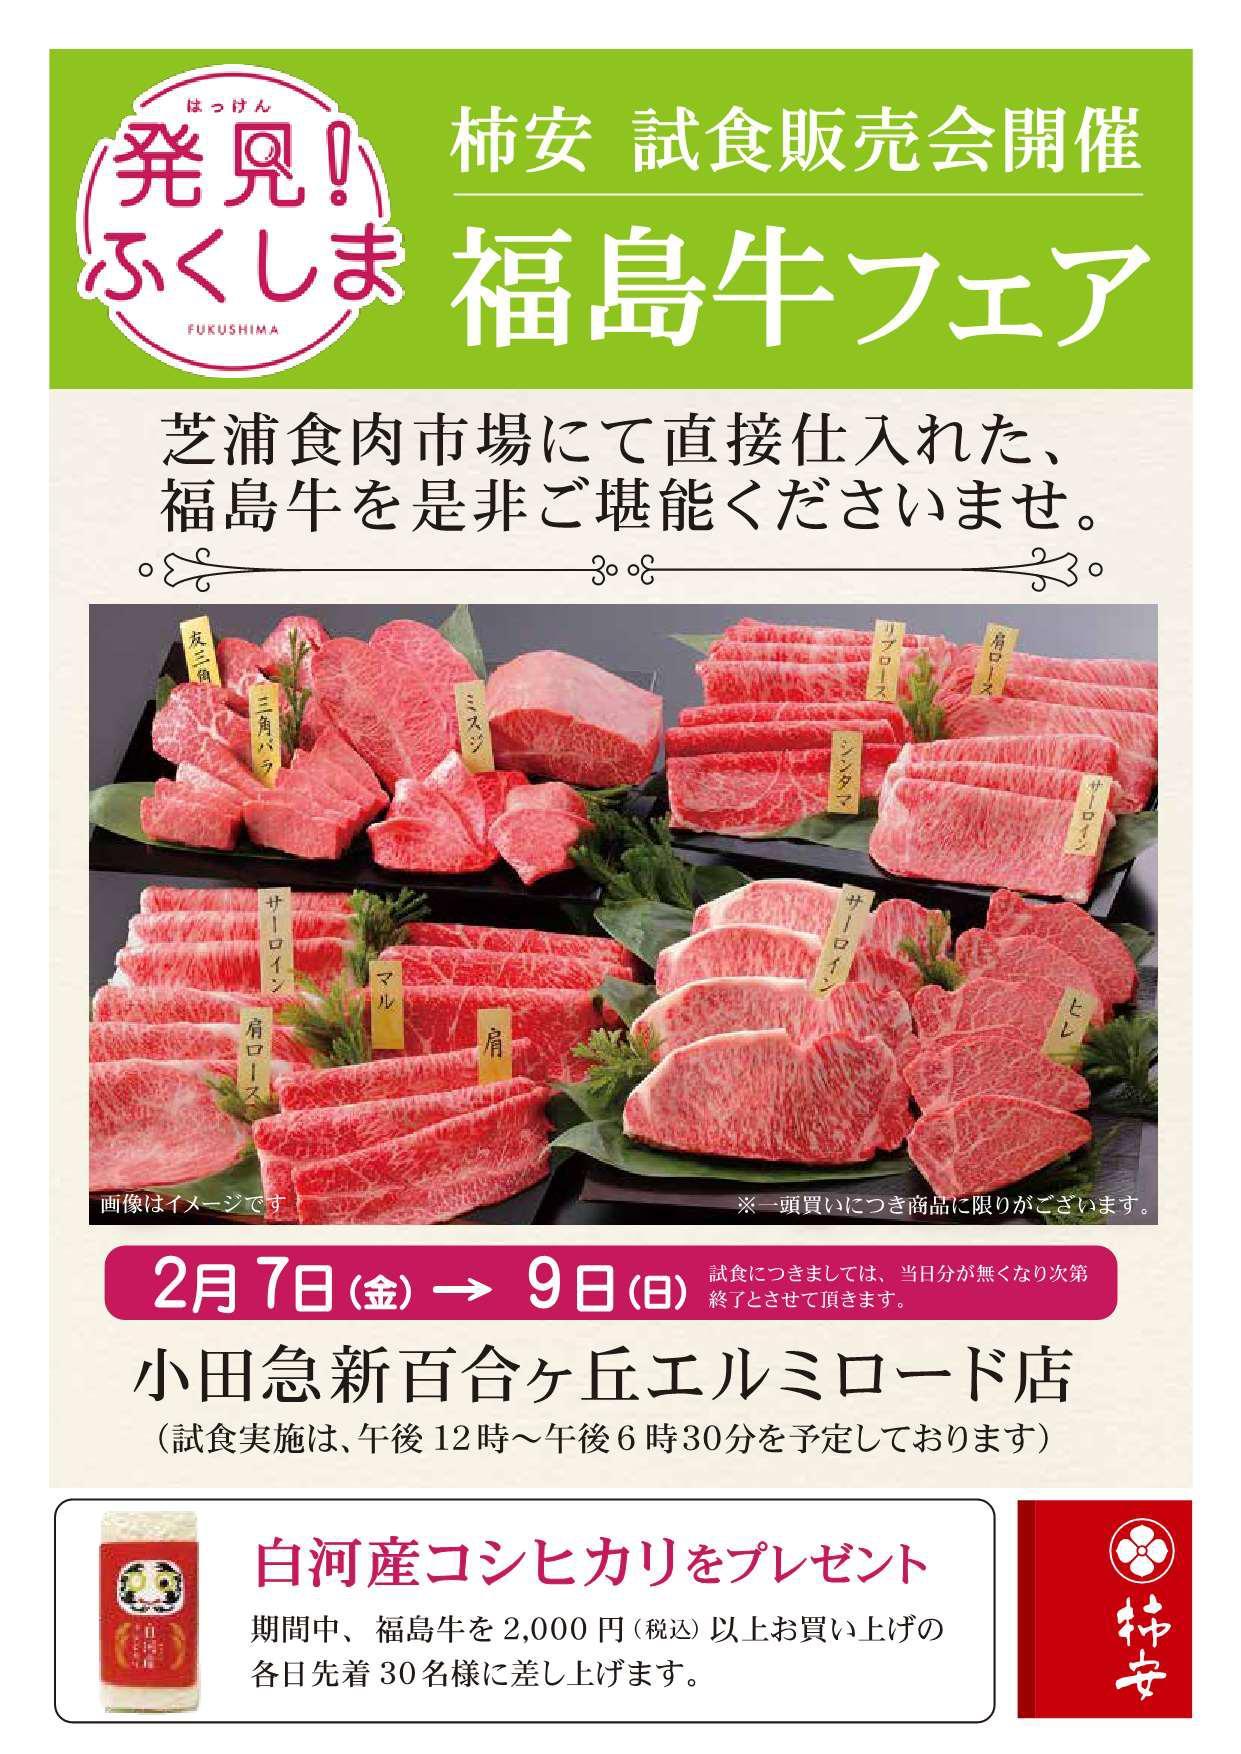 2月 新百合ヶ丘福島牛フェア告知POP.jpg